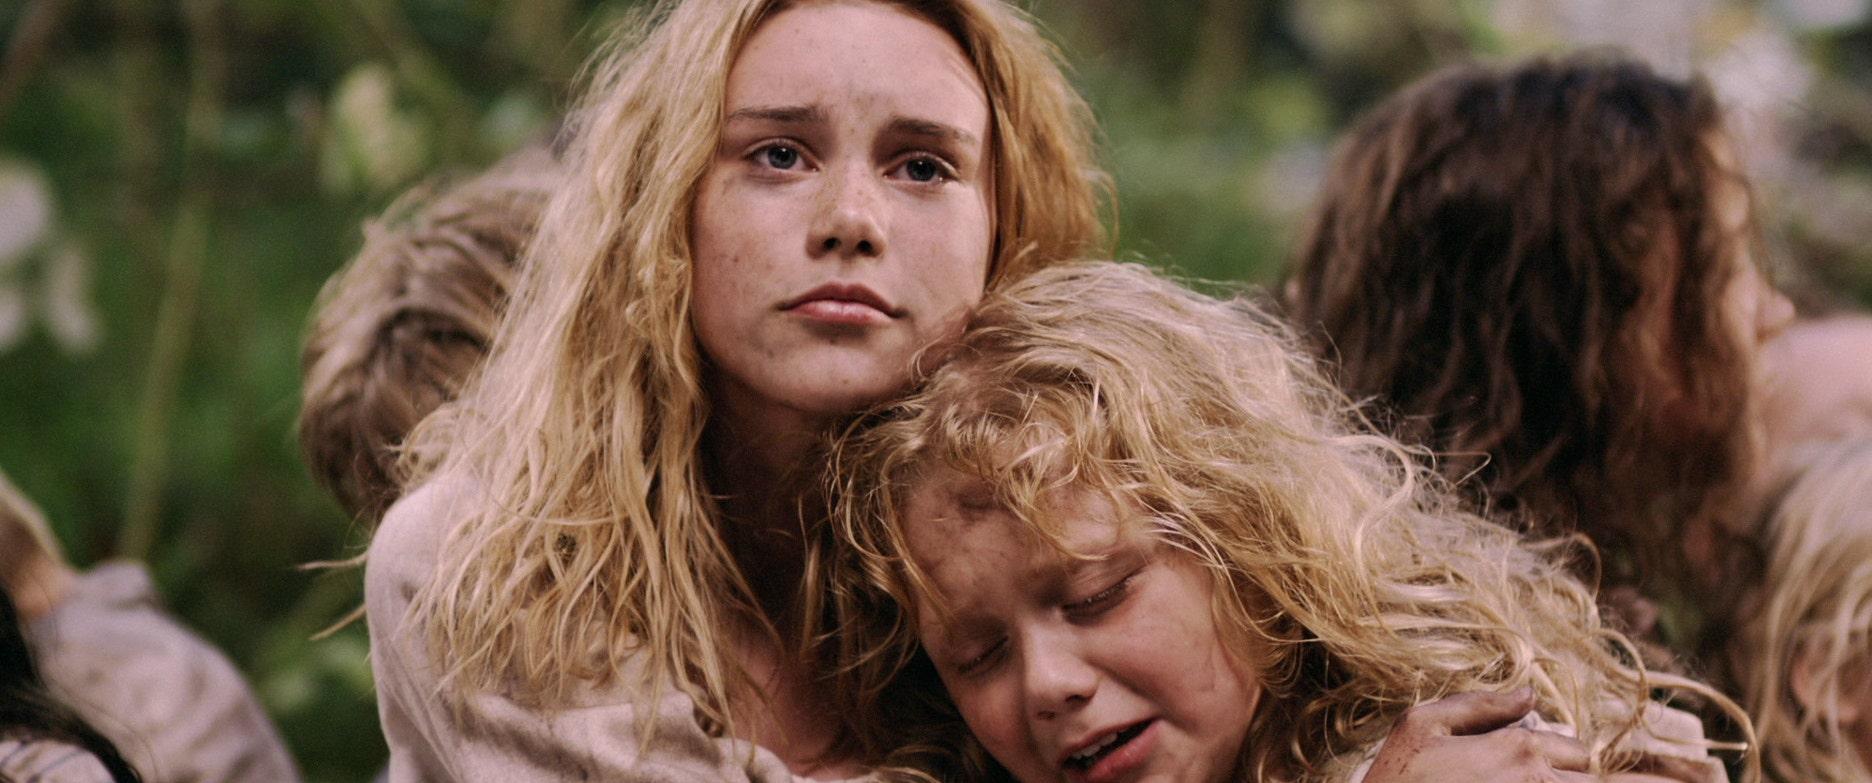 Prestigious producer criticizes the Academy for snubbing Christian film